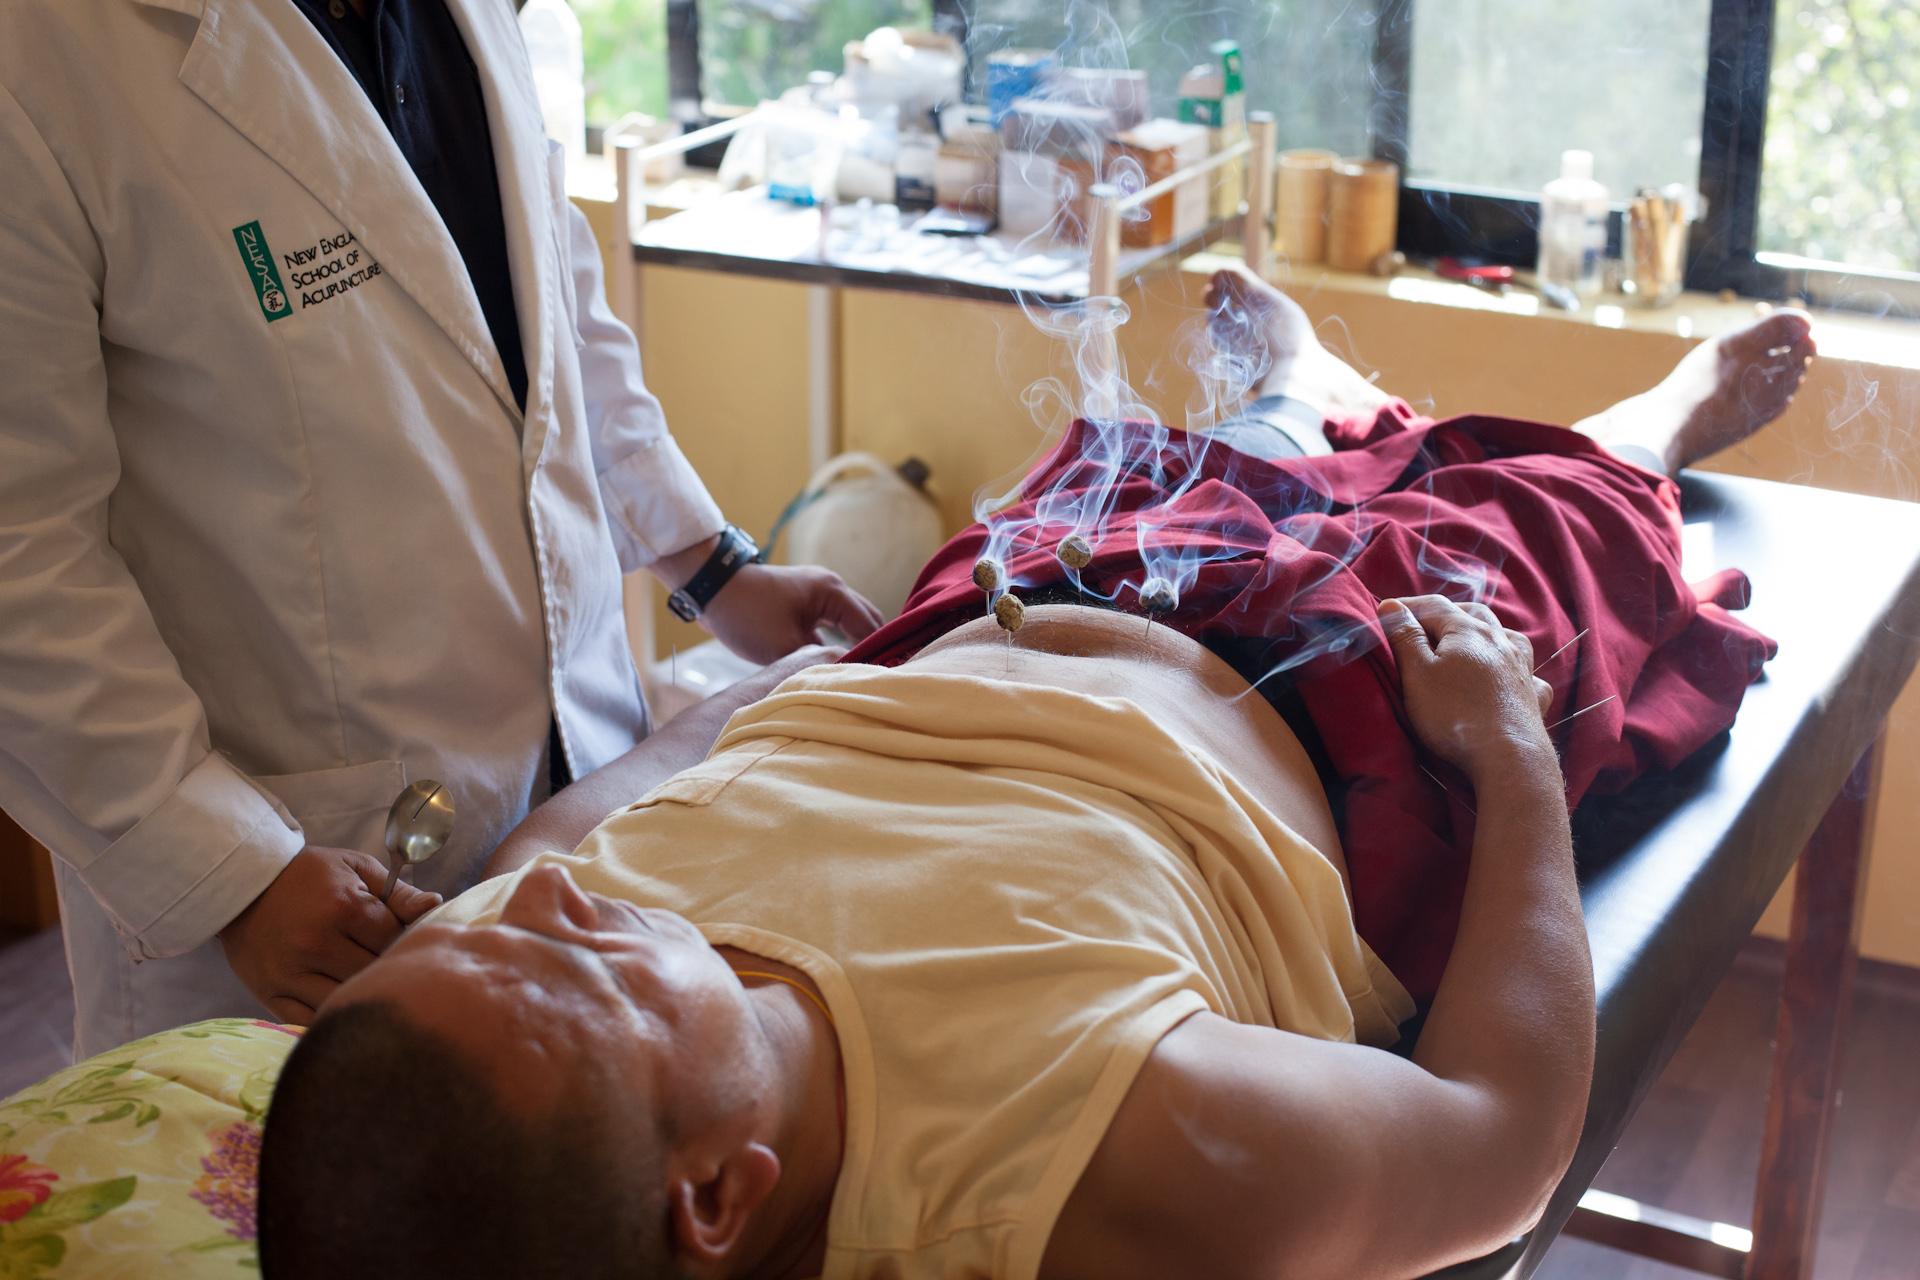 Humanitarian-Acupuncture-Mindful-Medicine-Nepal-Namo-buddha-Jason-Bax-01.JPG